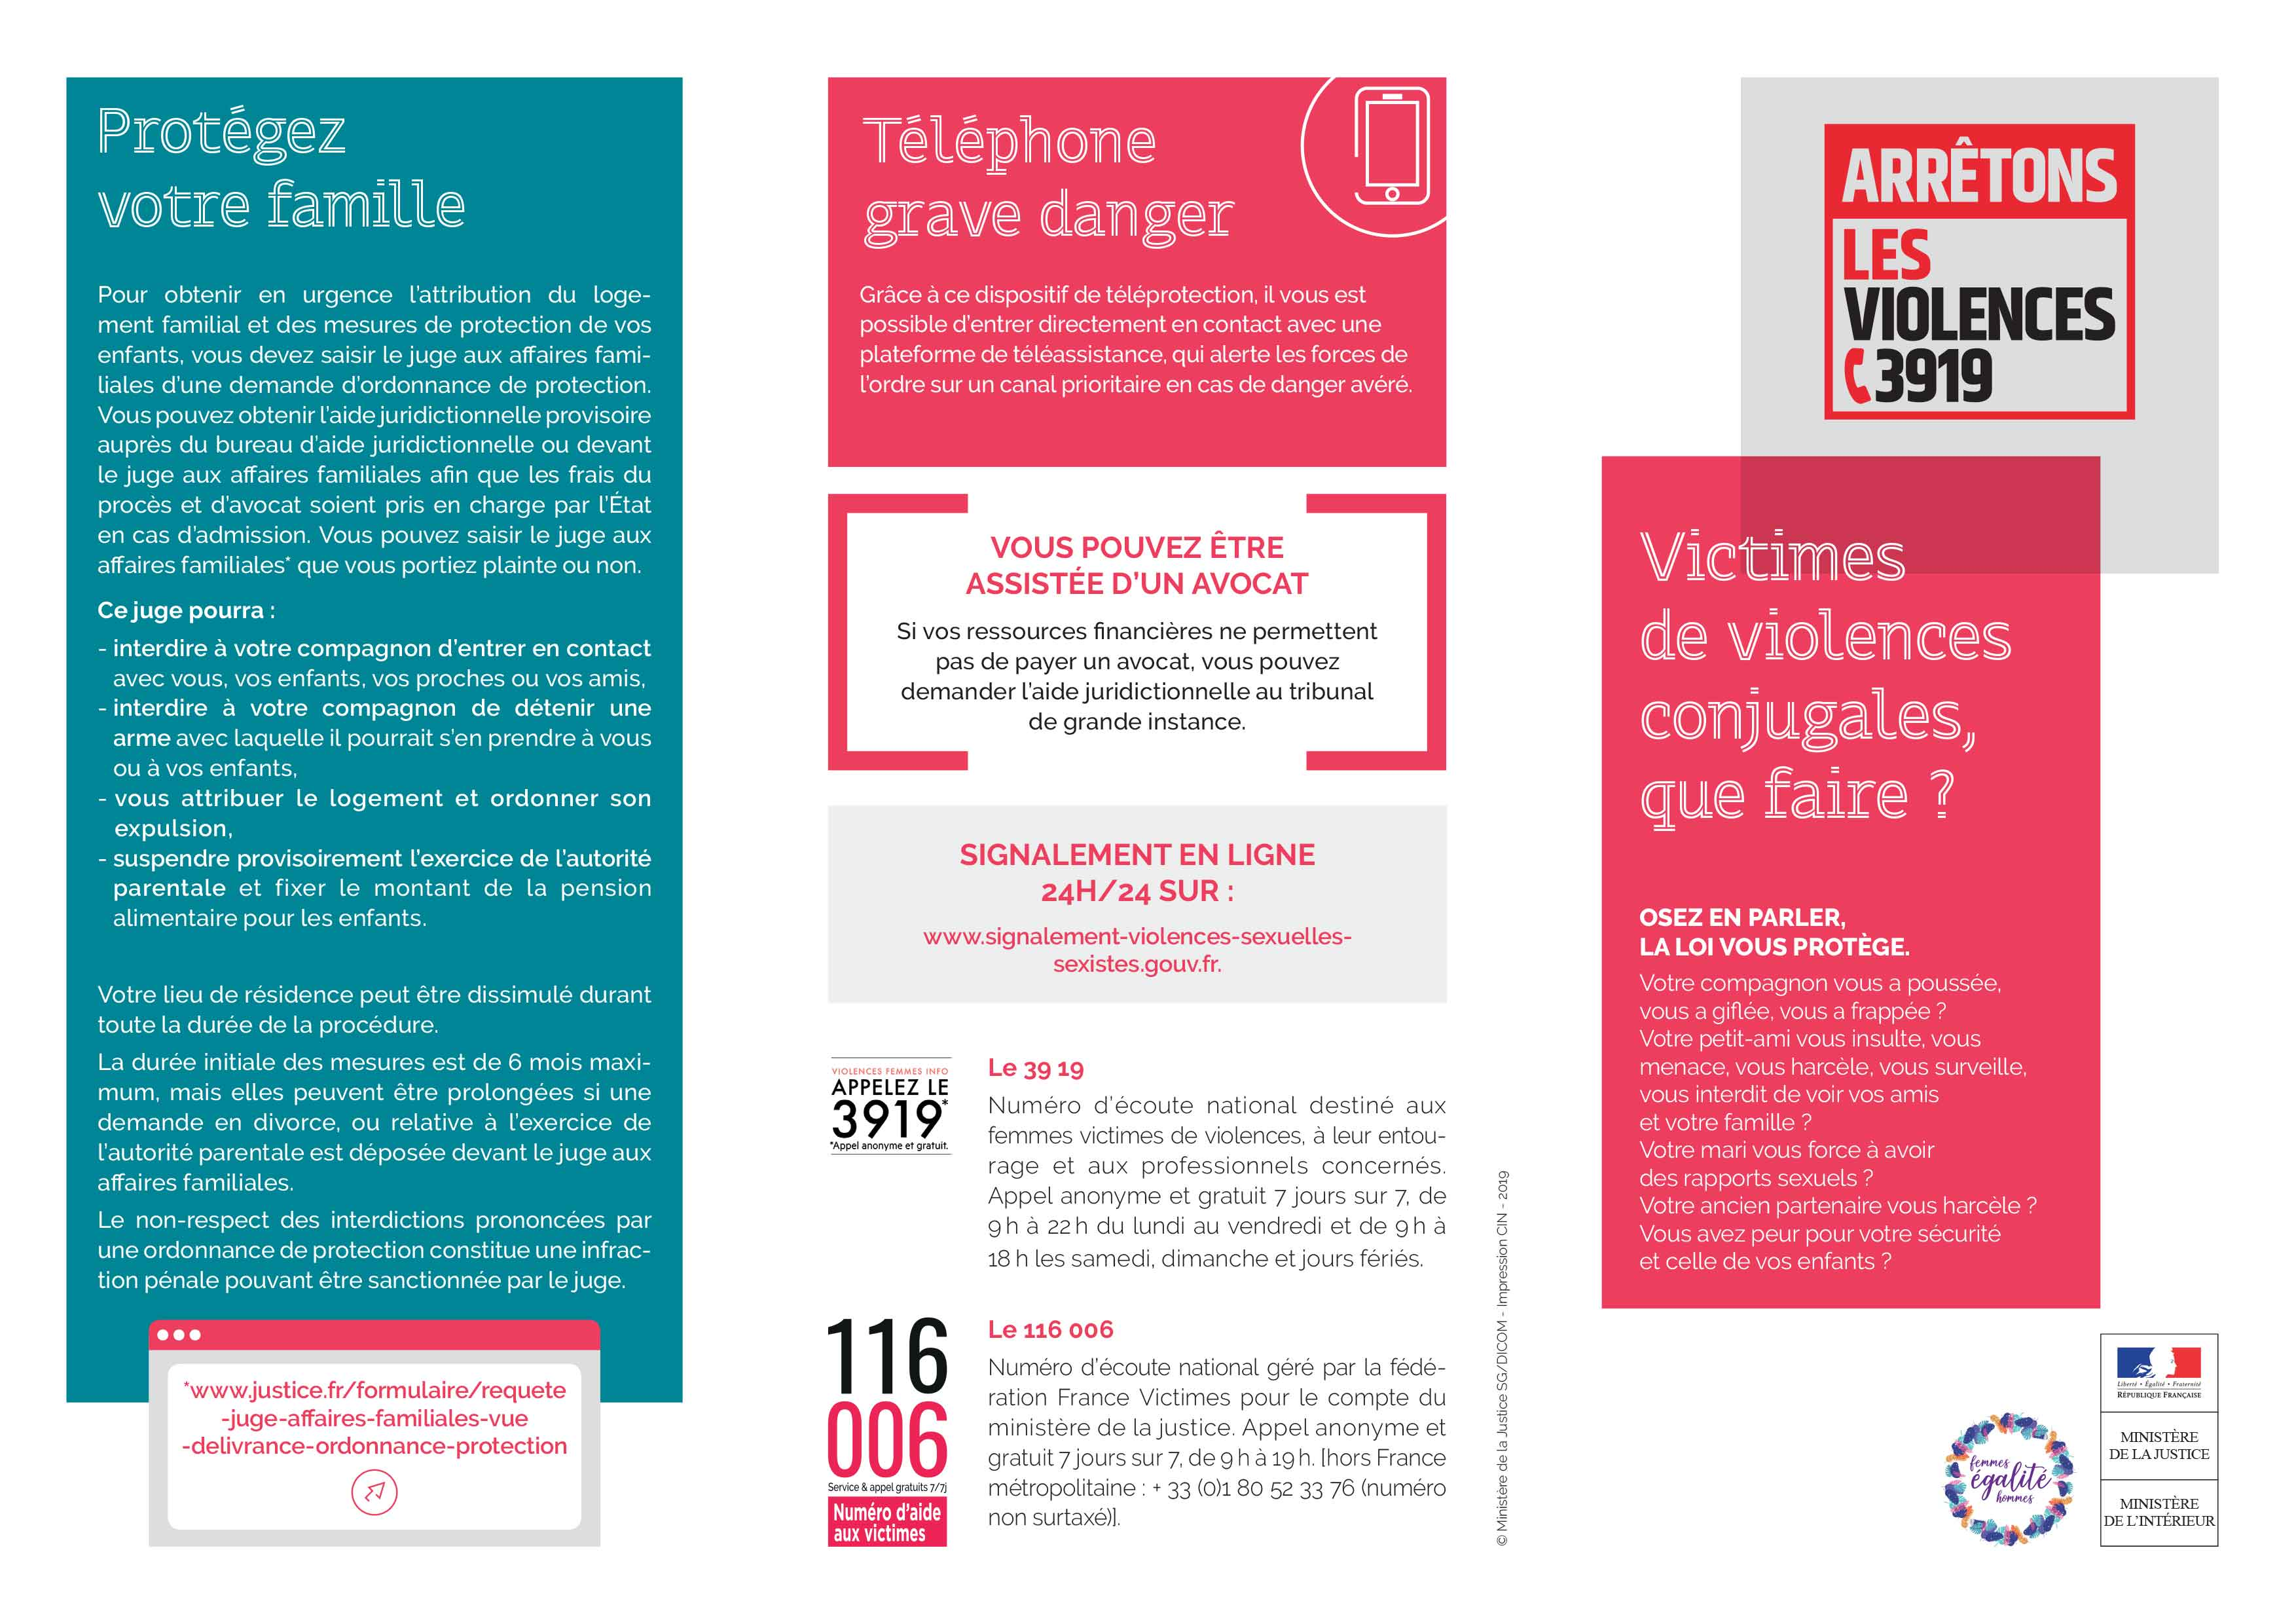 Violences-conjugales-1.jpg